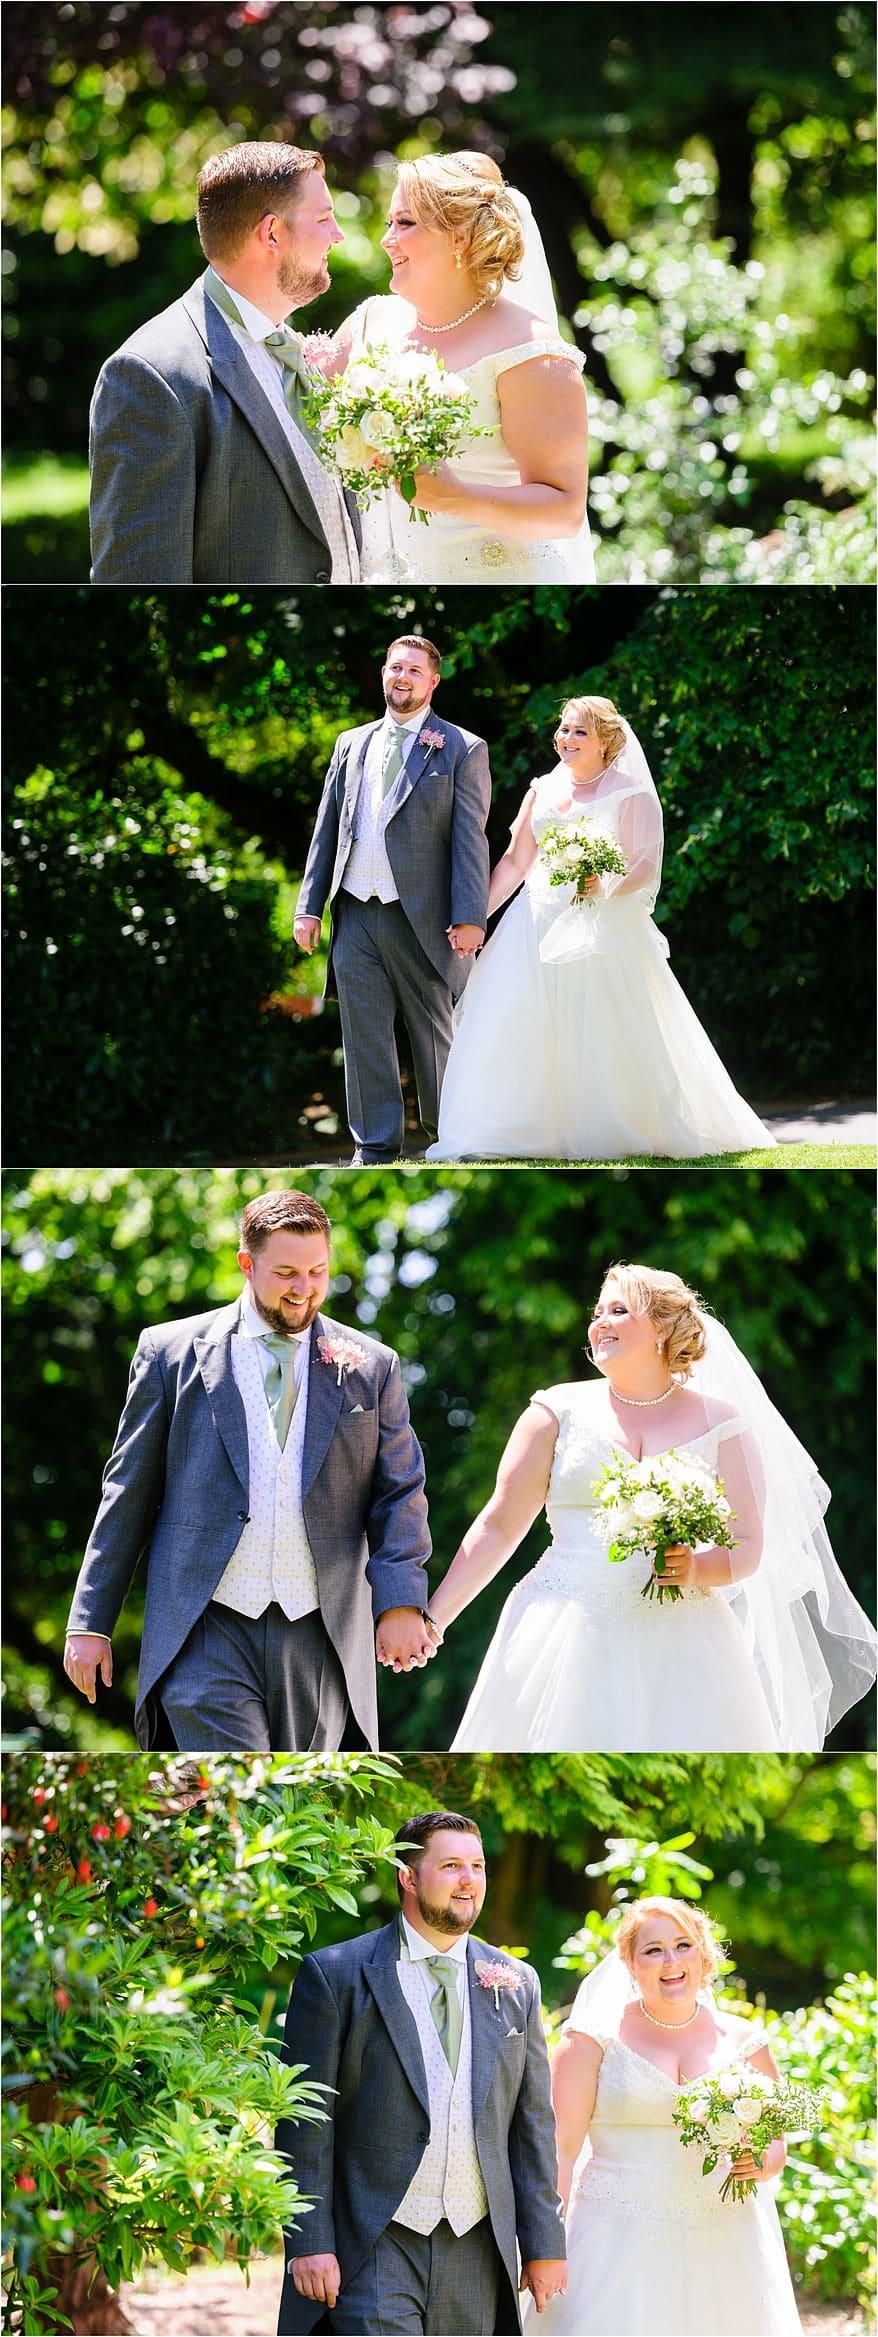 wedding photographs at my latest Alverton Hotel Wedding